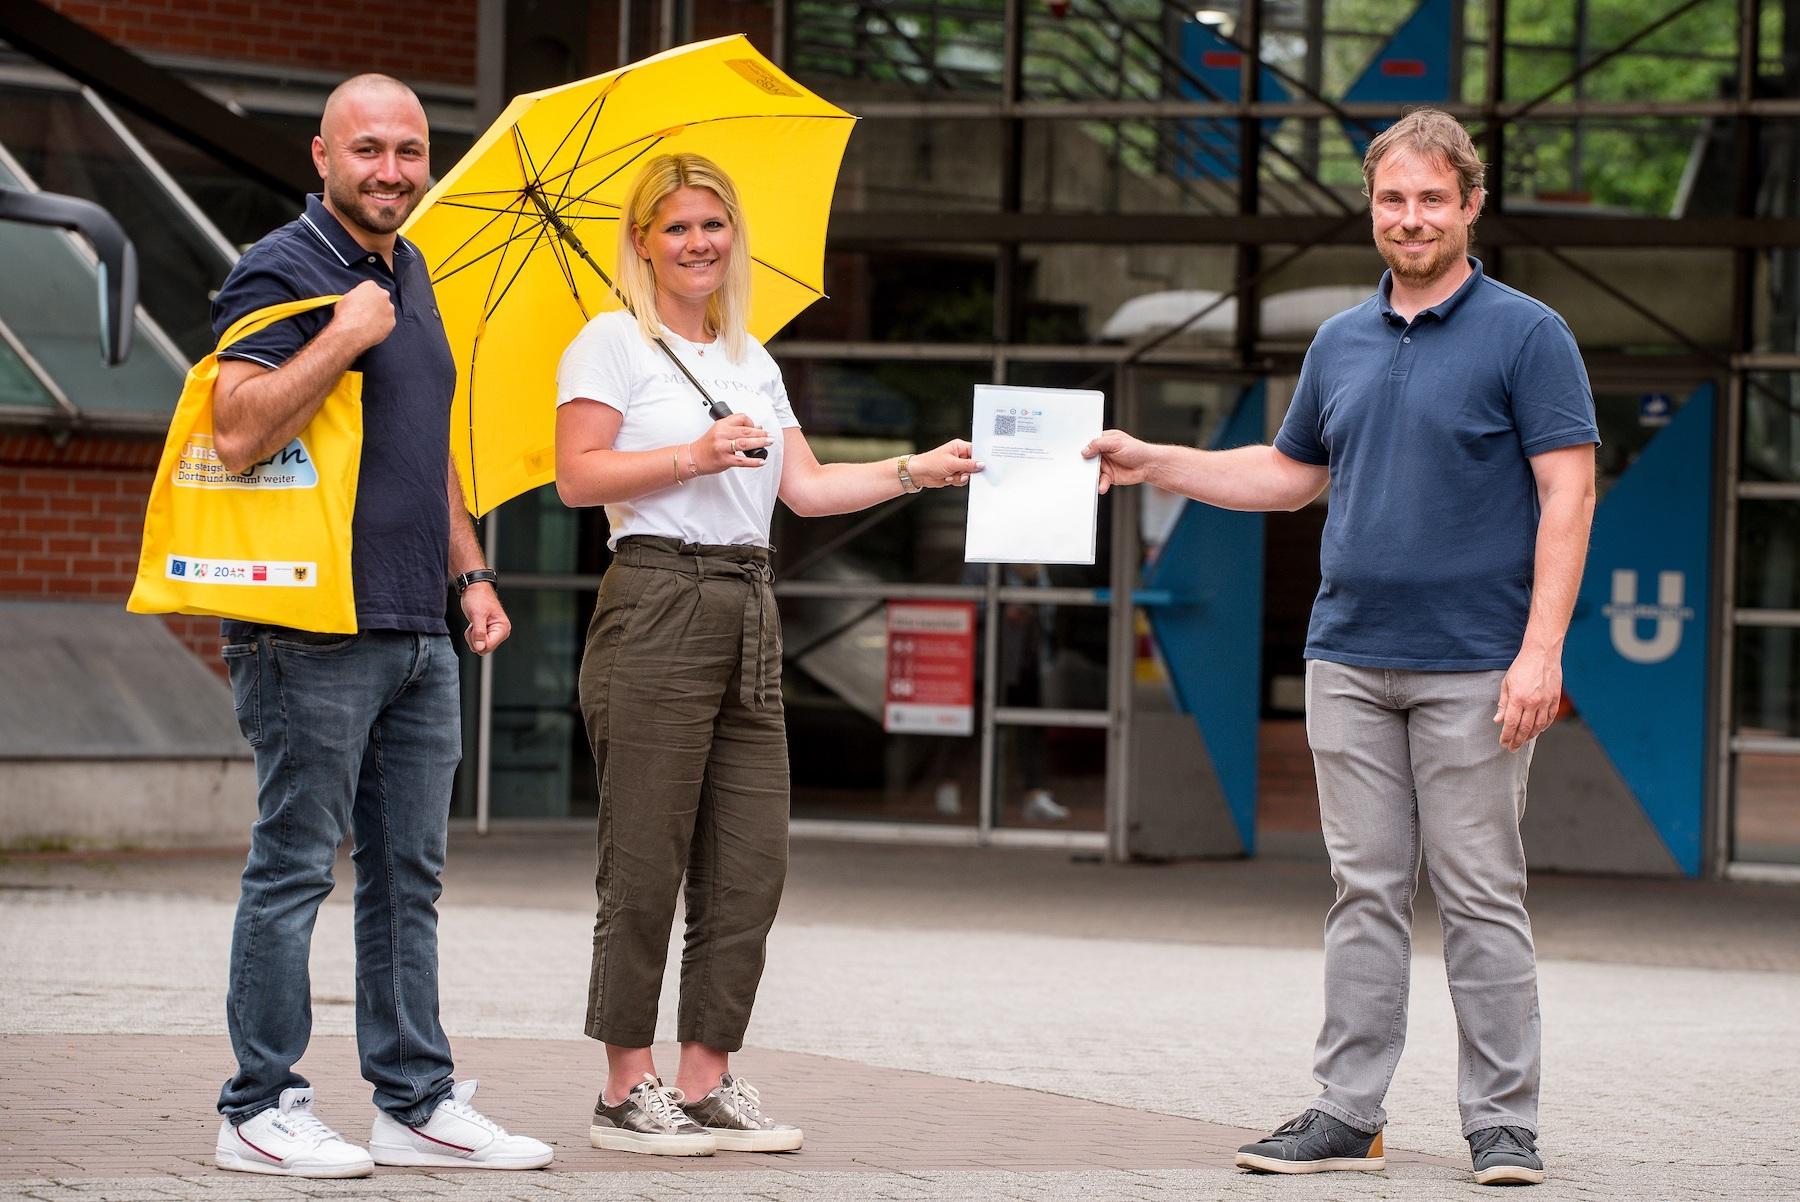 Familie Ekeryilmaz erhält ÖPNV-Ticket